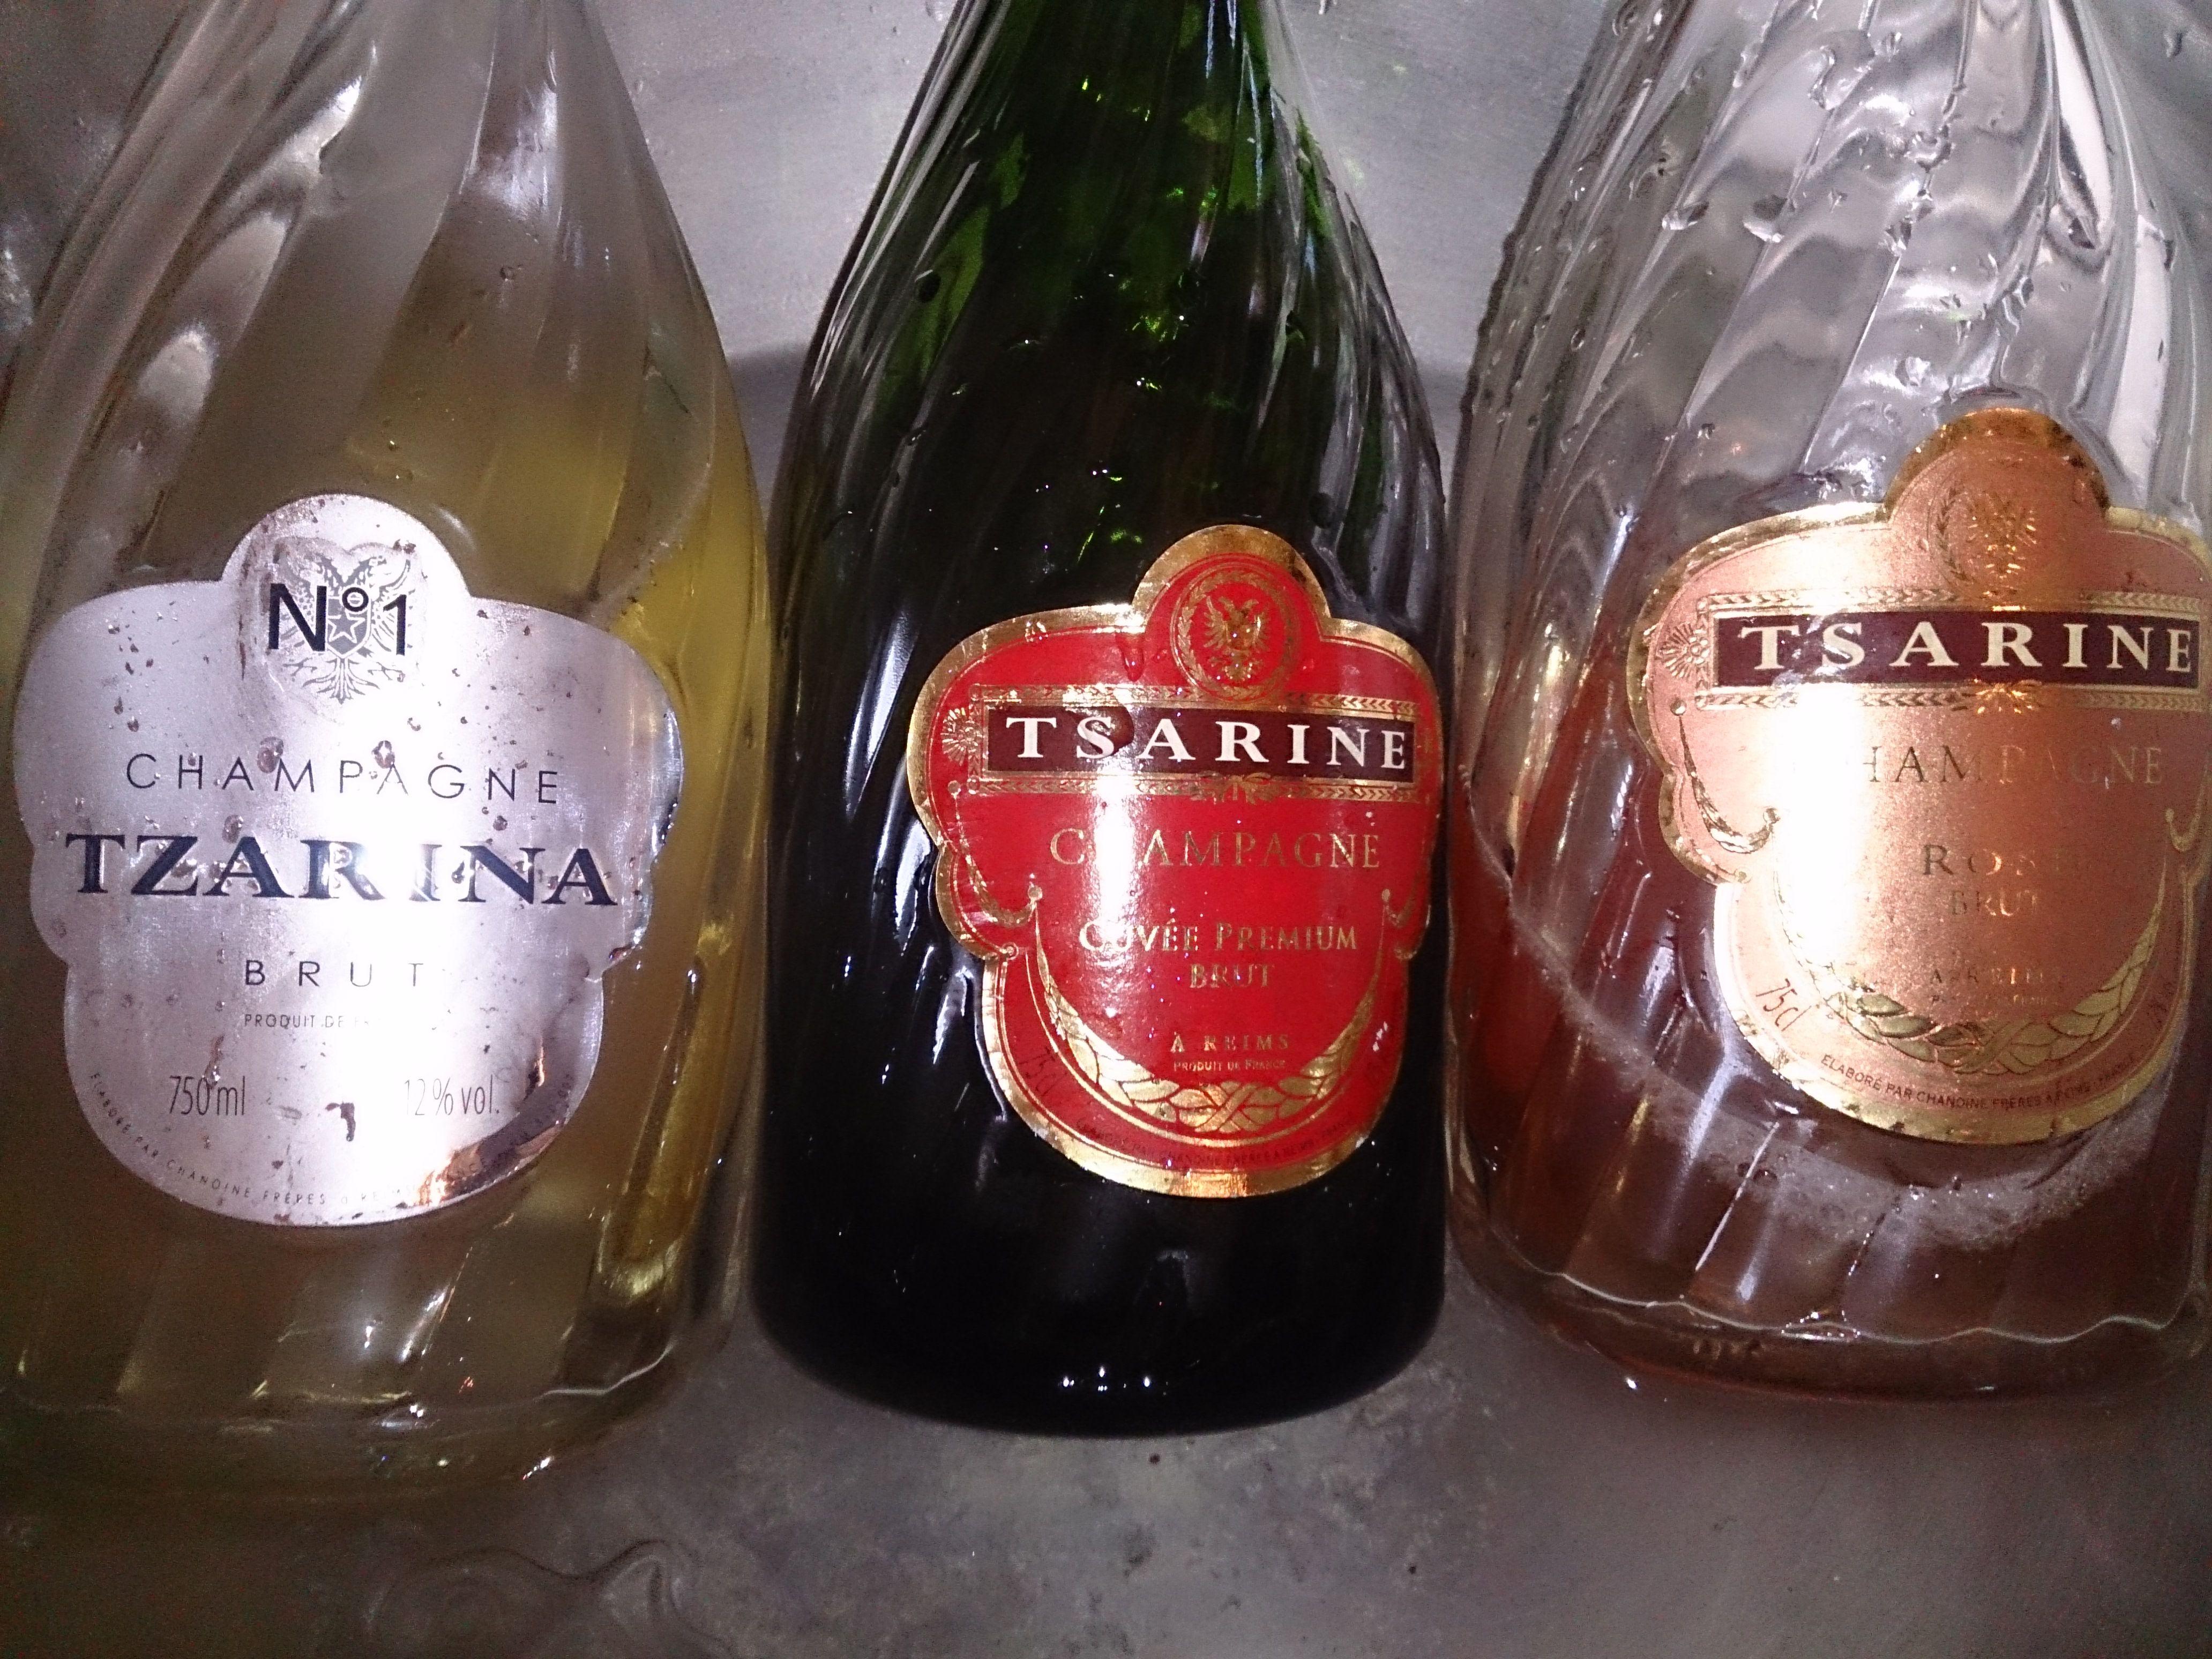 Tsarine Champagne Champagne Banqueting House Whitehall